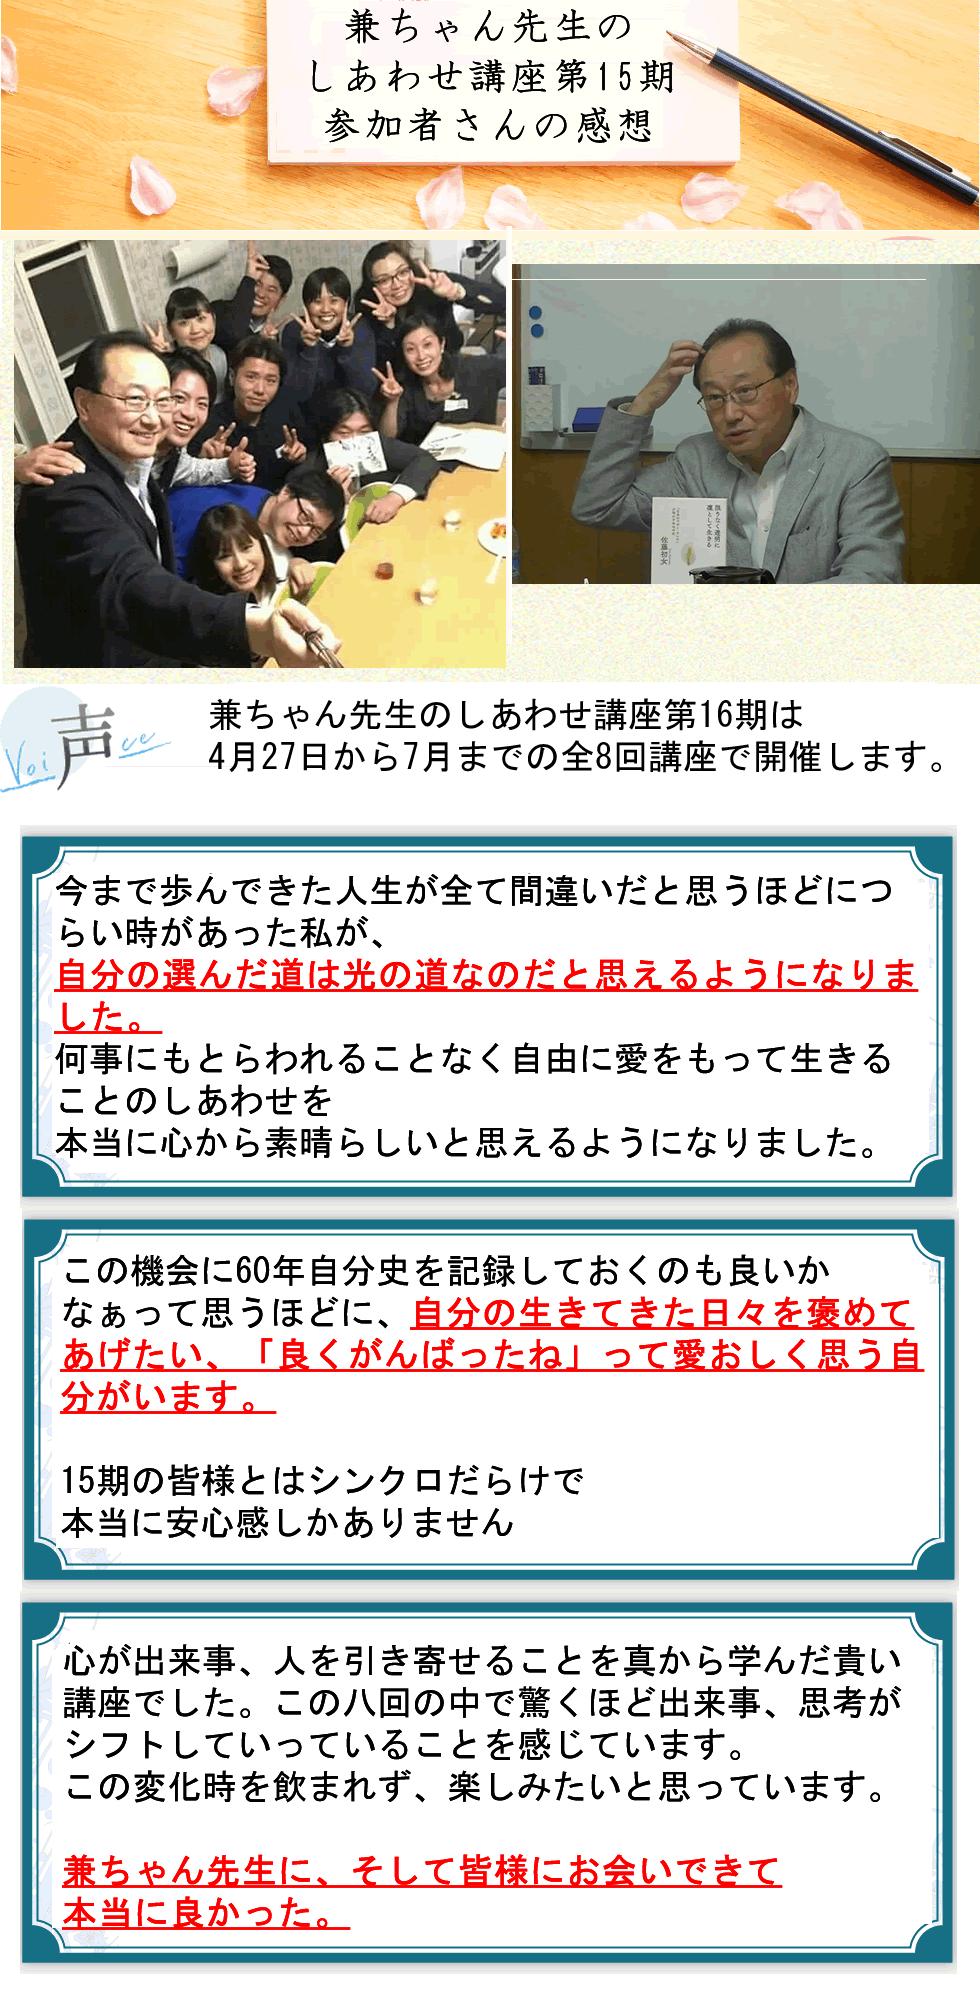 15kiisiawasekouzakansou - 兼ちゃん先生のしあわせ講座